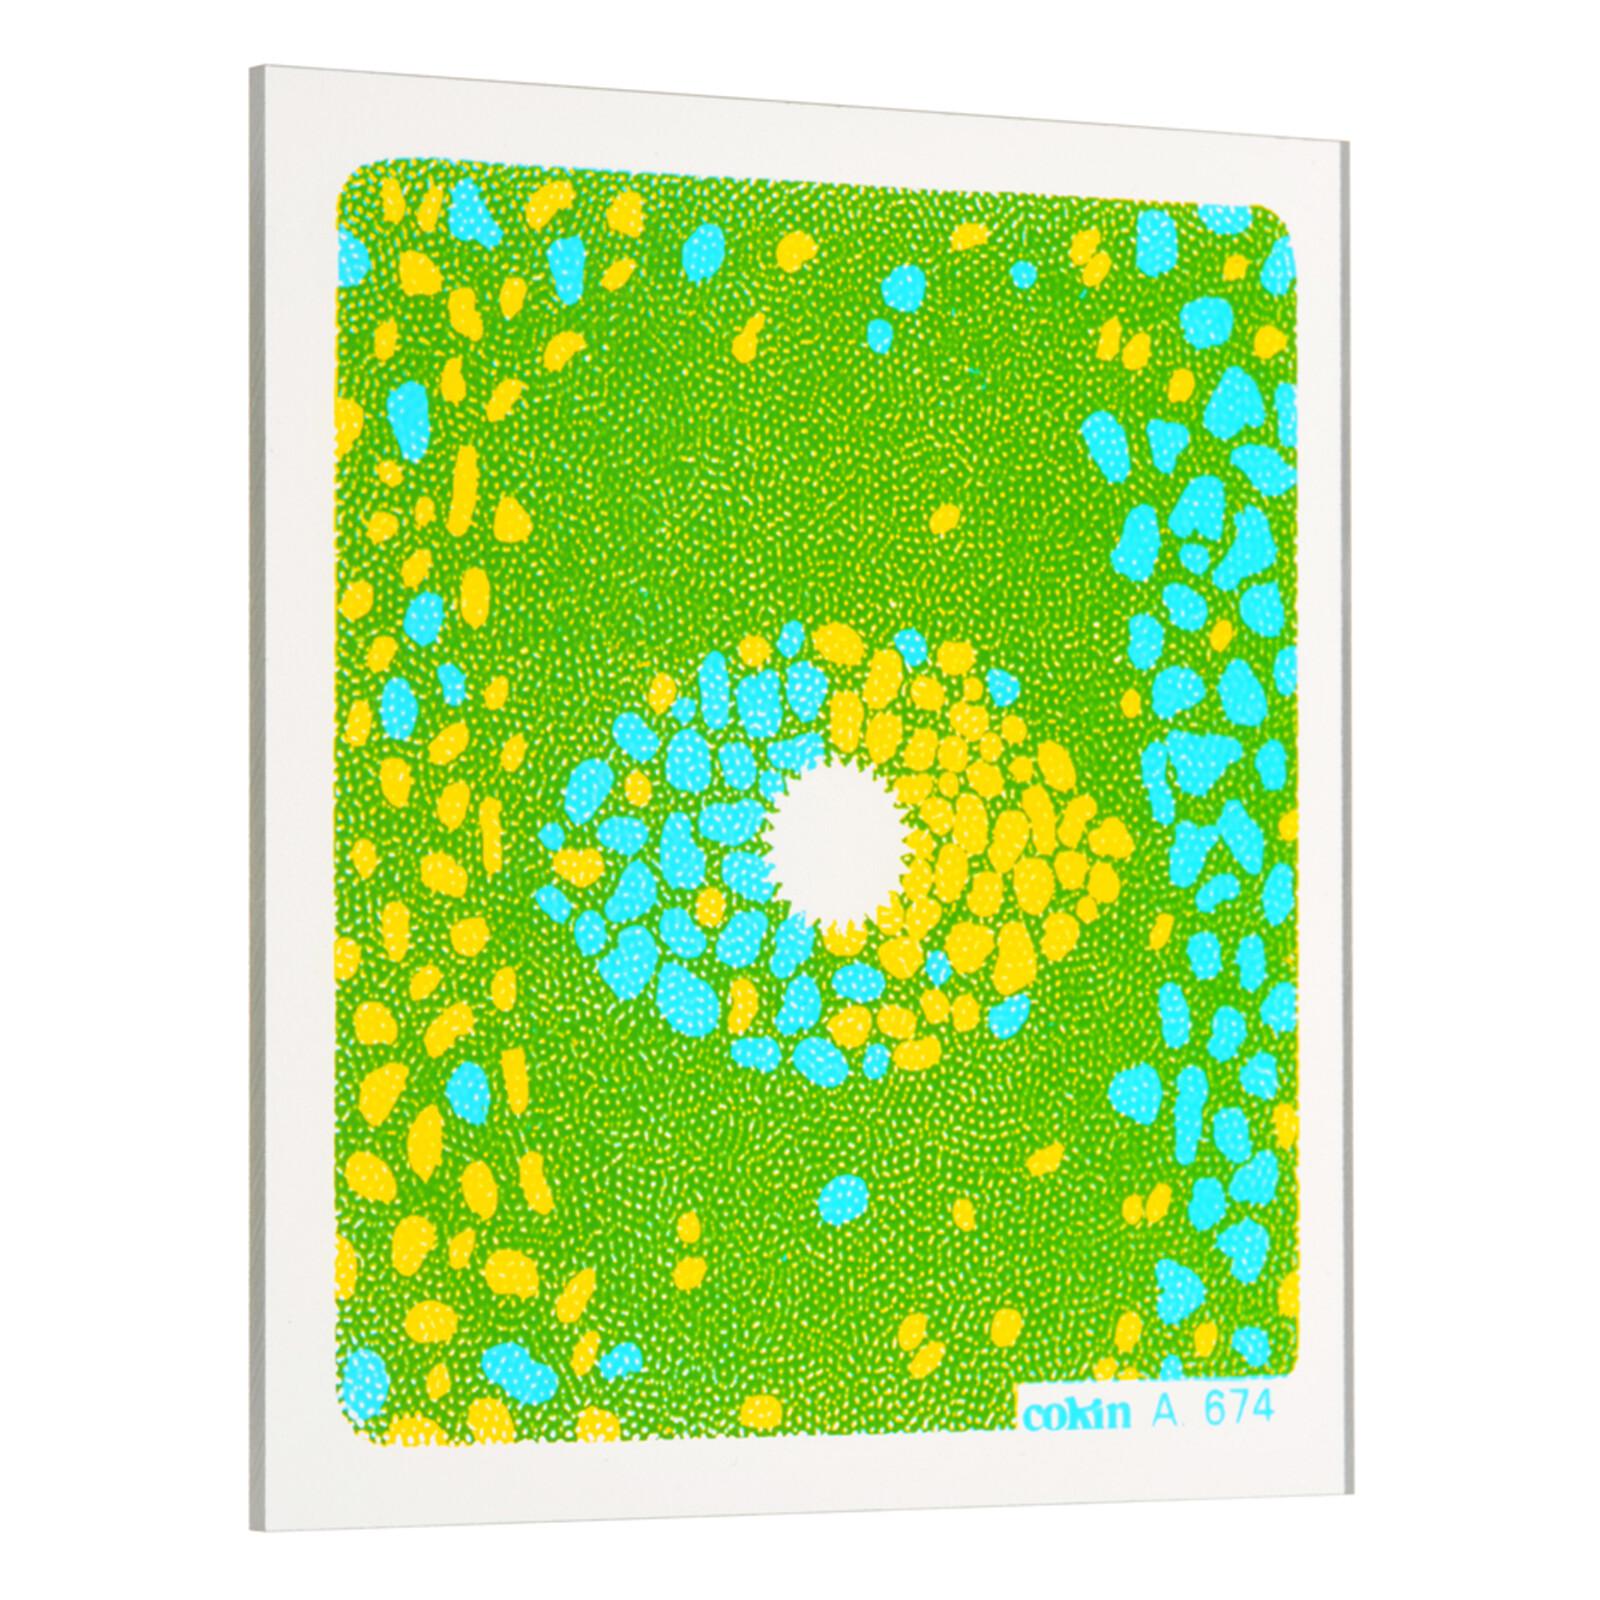 Cokin P674 Center Spot 2 Blau/Gelb